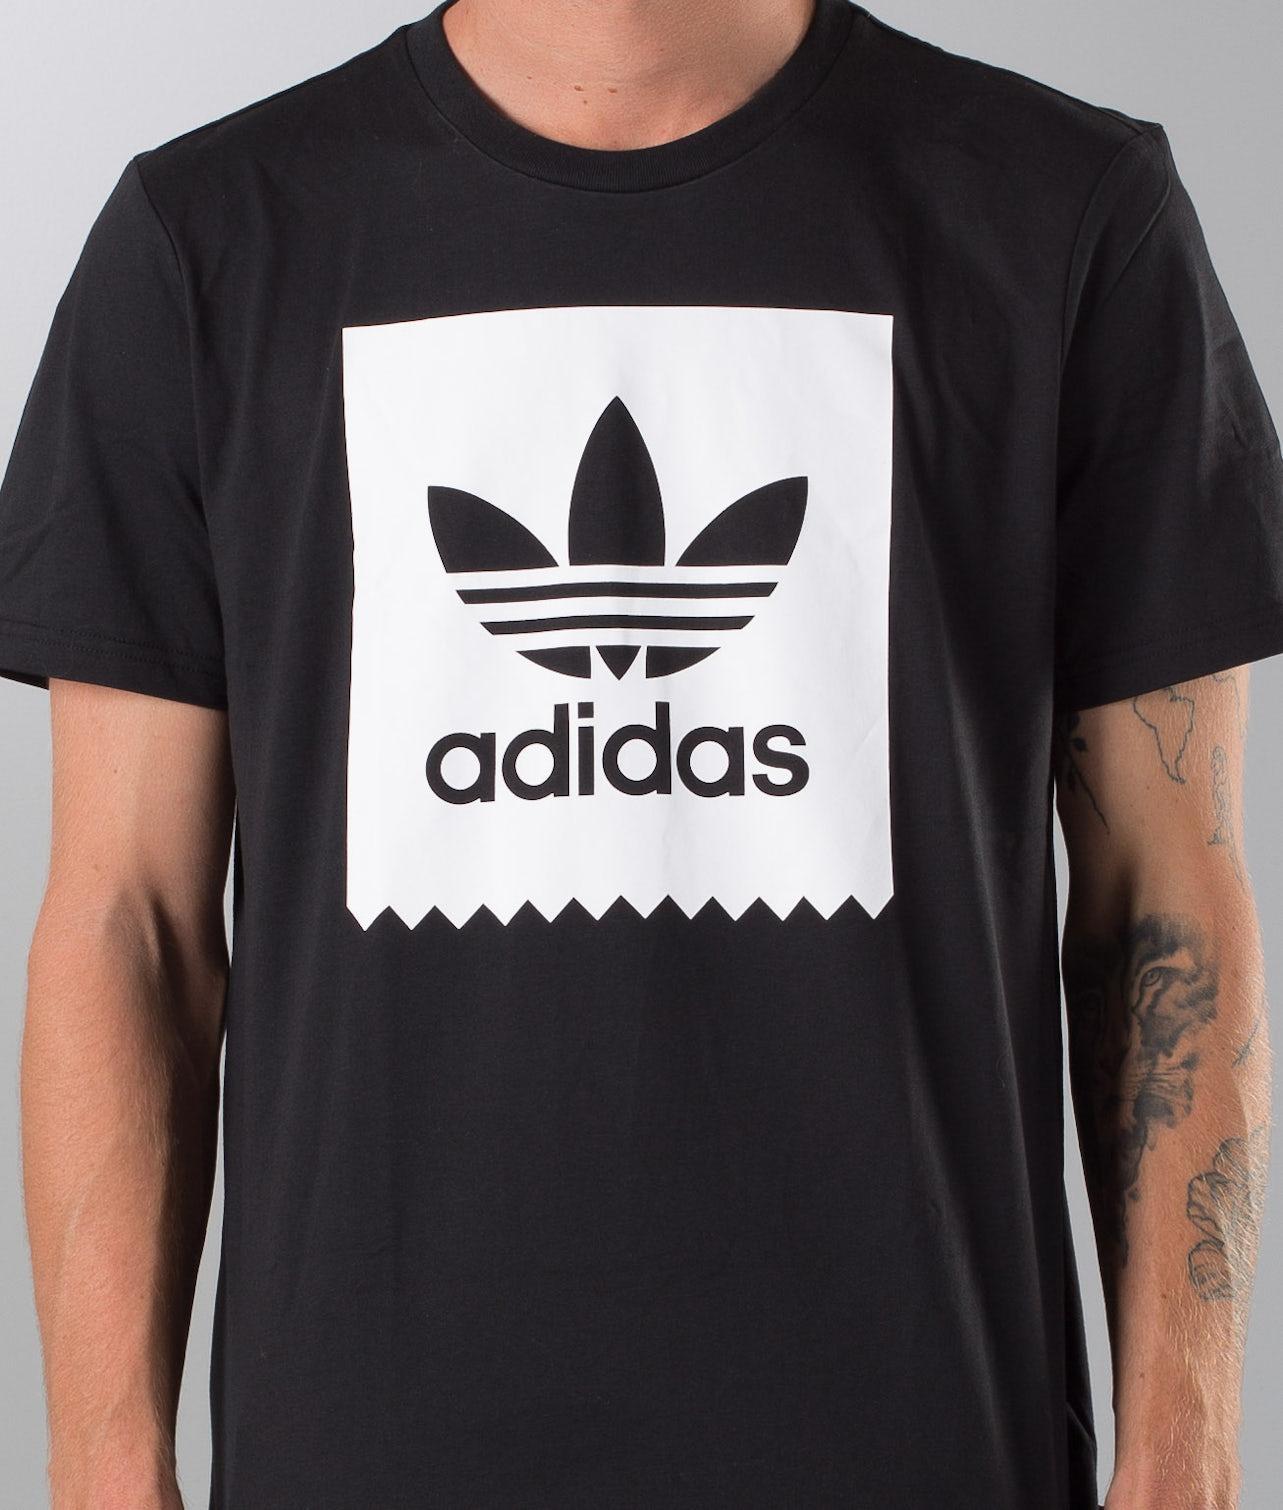 Adidas Skateboarding Solid Bb T-shirt Black/White